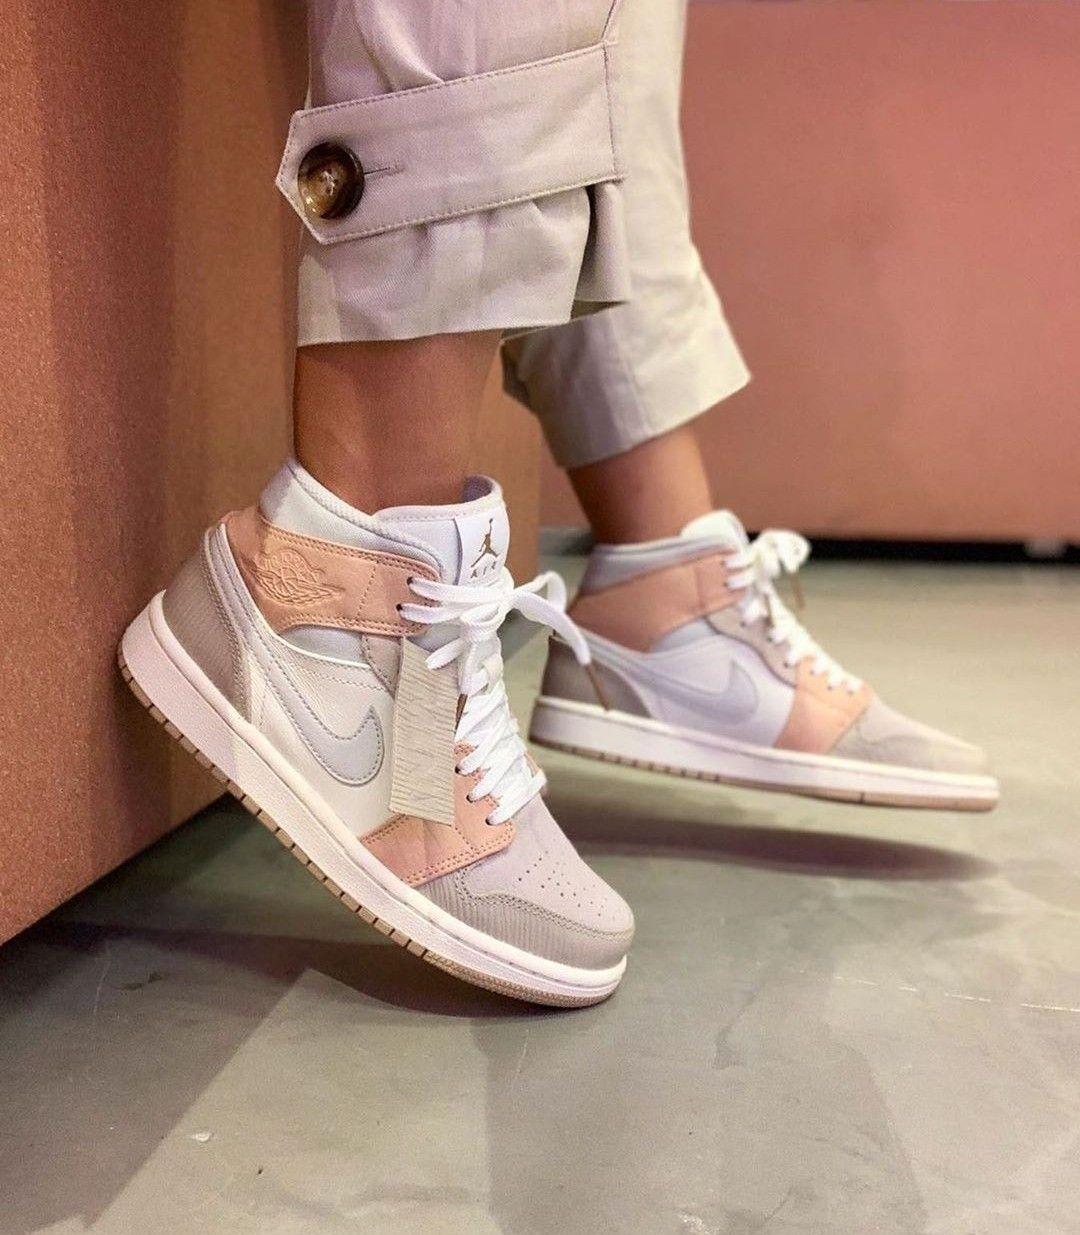 Jordan 1 Mid Milan In 2020 Sneakers Fashion Nike Shoes Women Jordan Shoes Girls